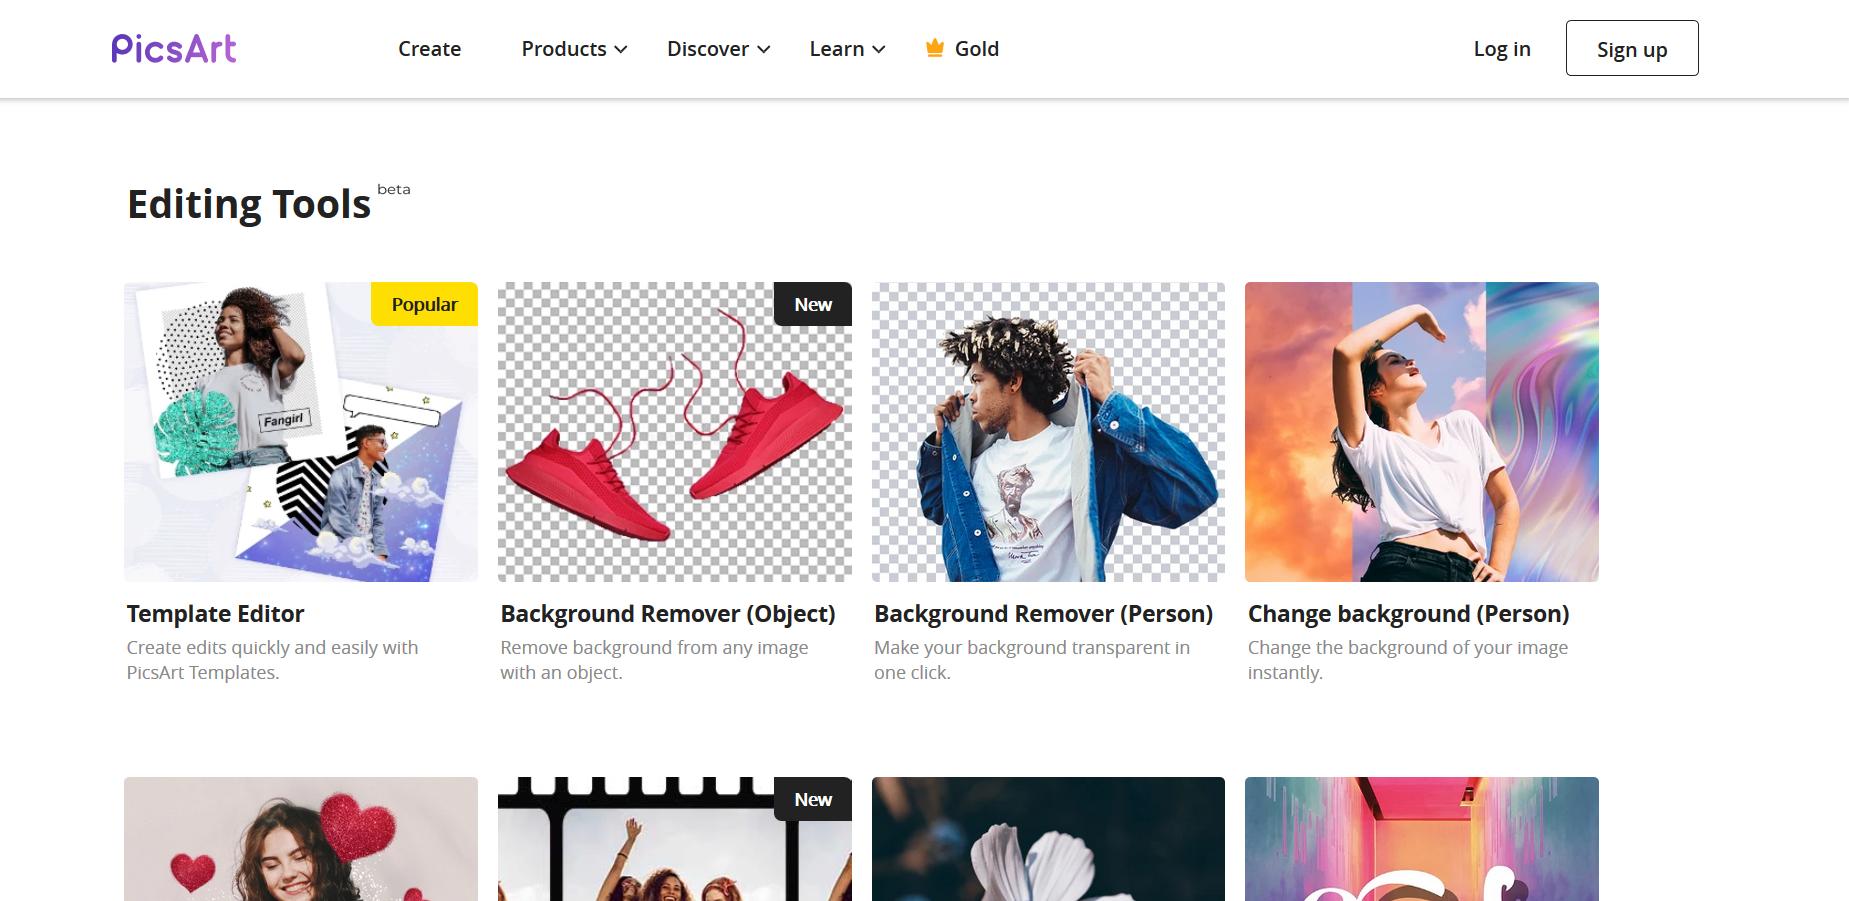 PicsArt free online photo editing tool